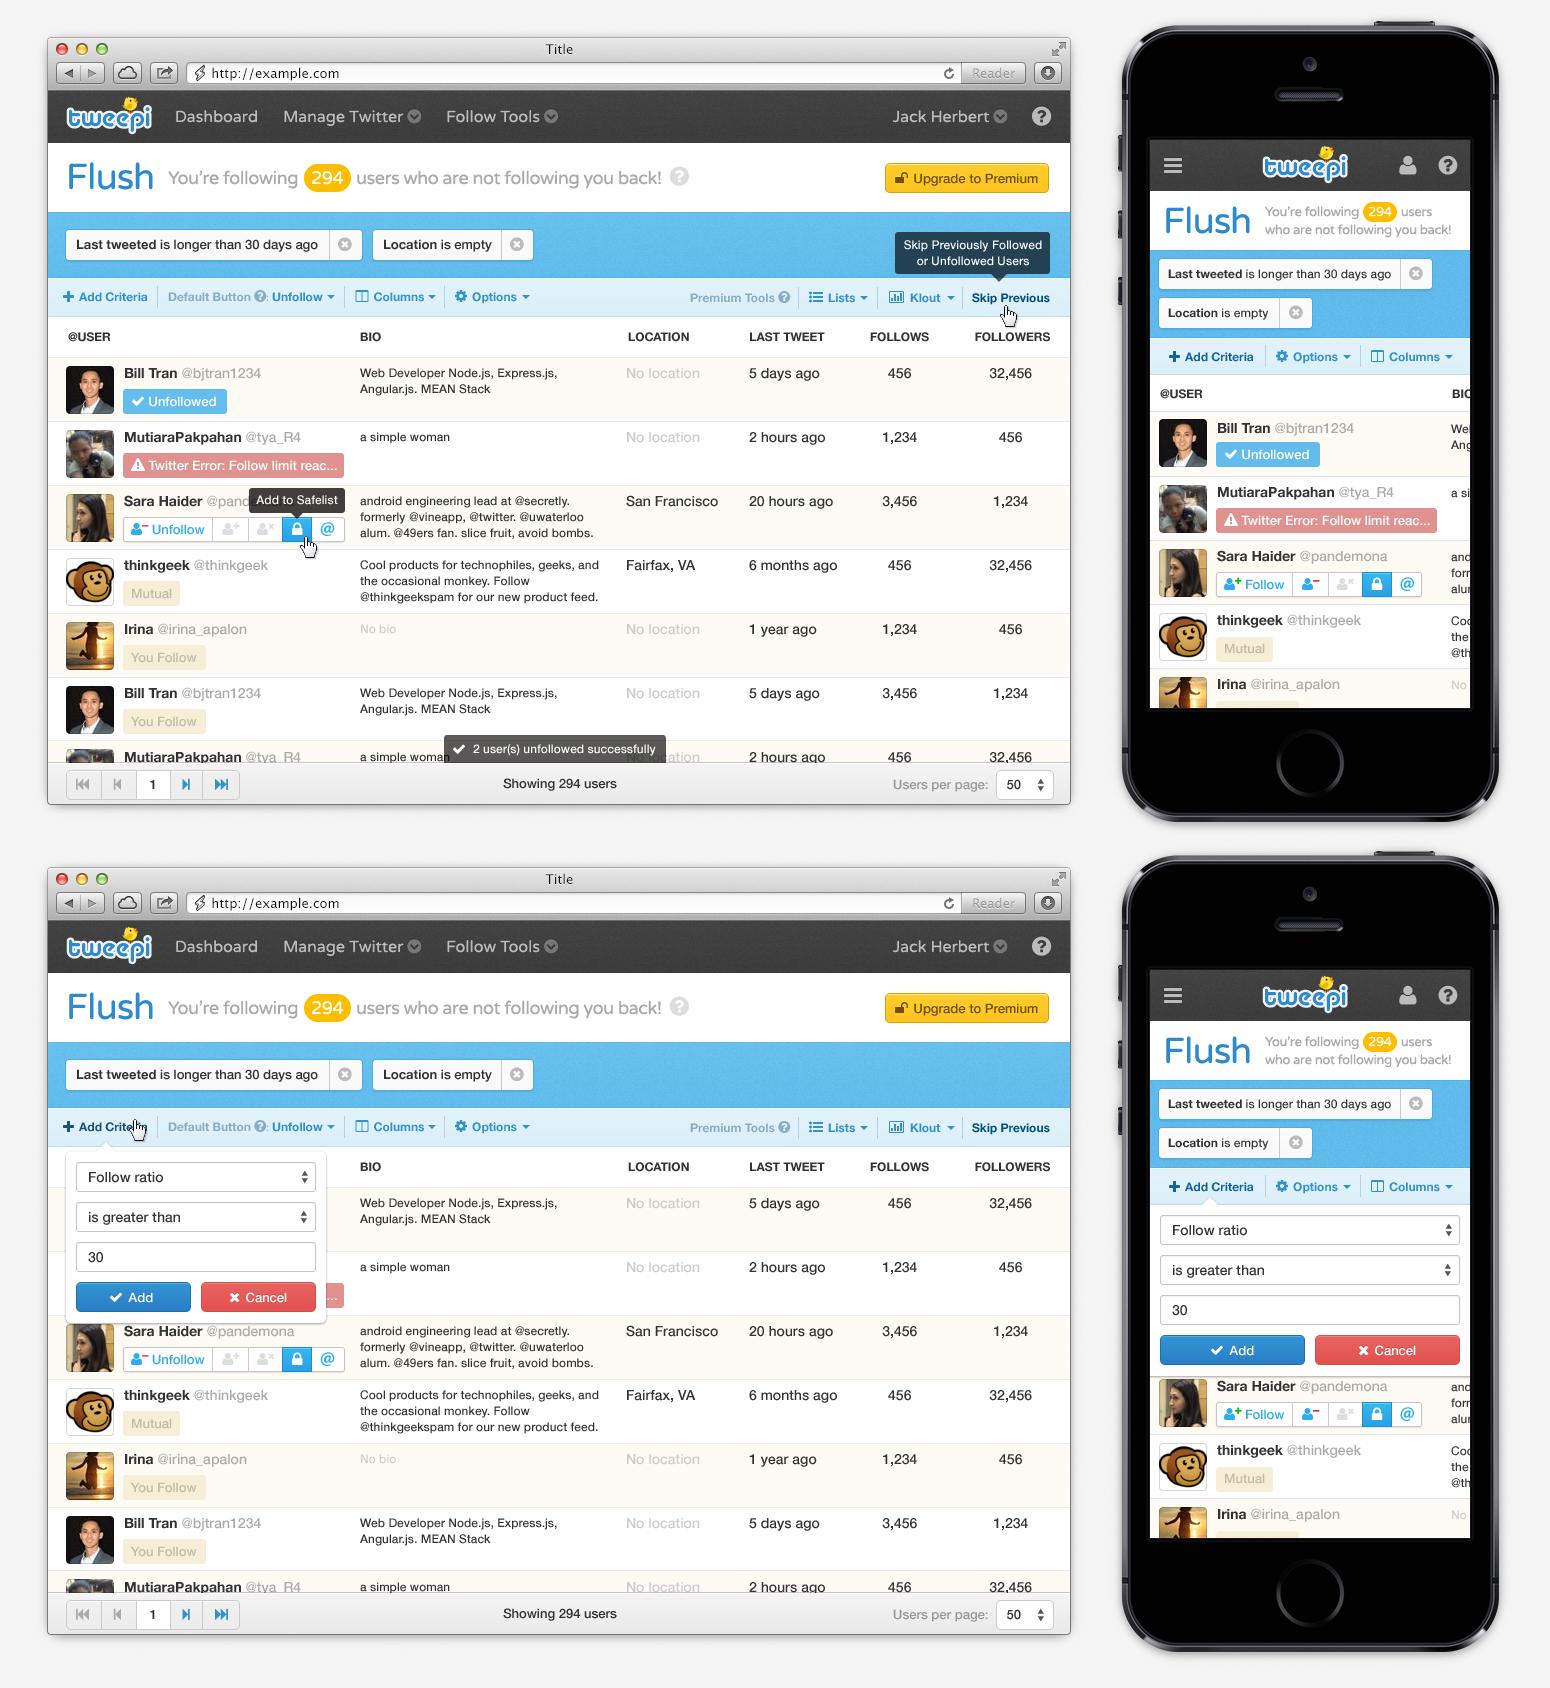 Tweepi desktop web-app: user experience and visual design